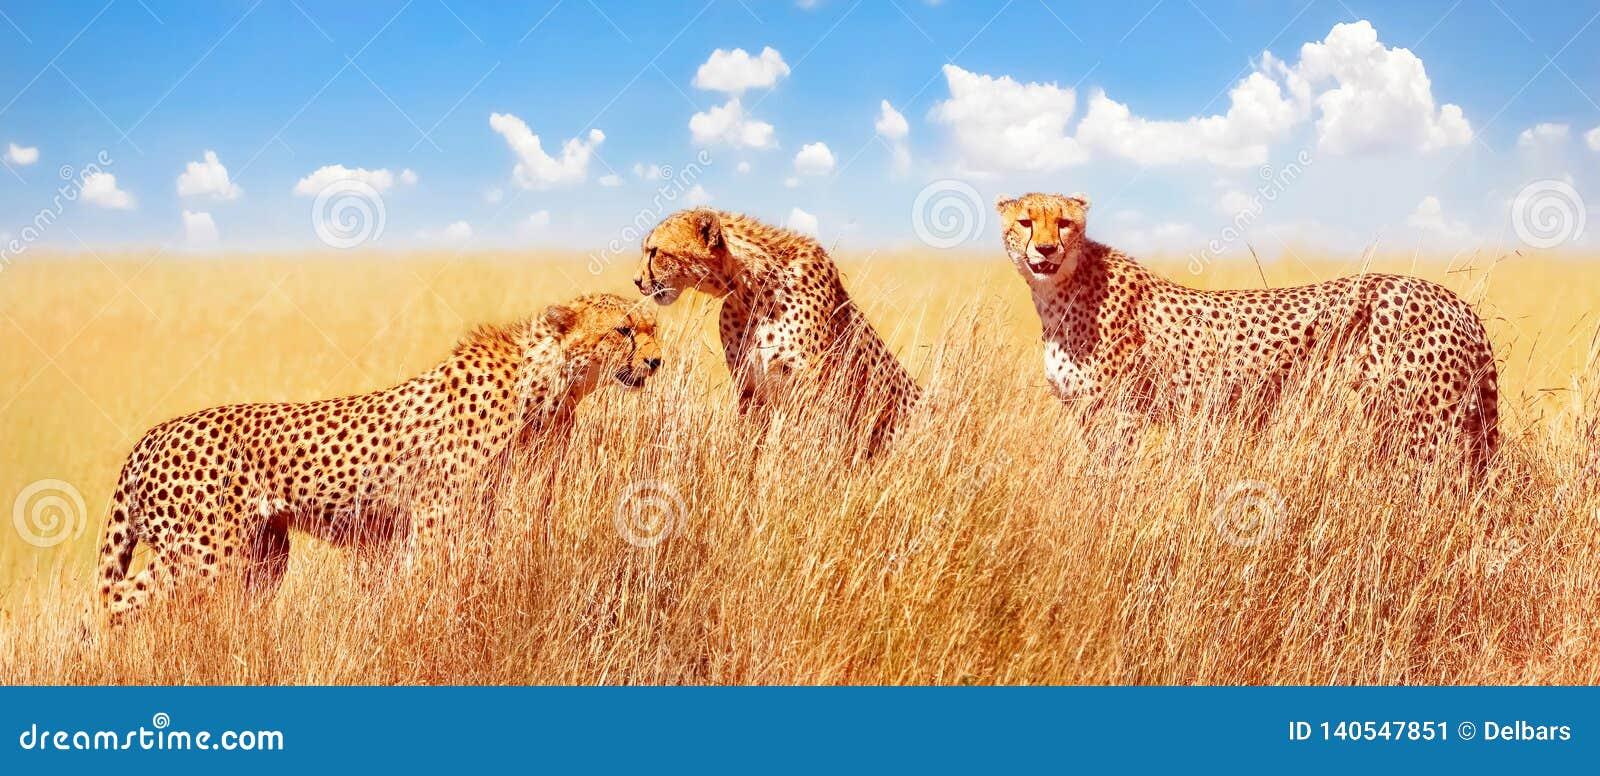 Group of cheetahs in the African savannah. Africa, Tanzania, Serengeti National Park